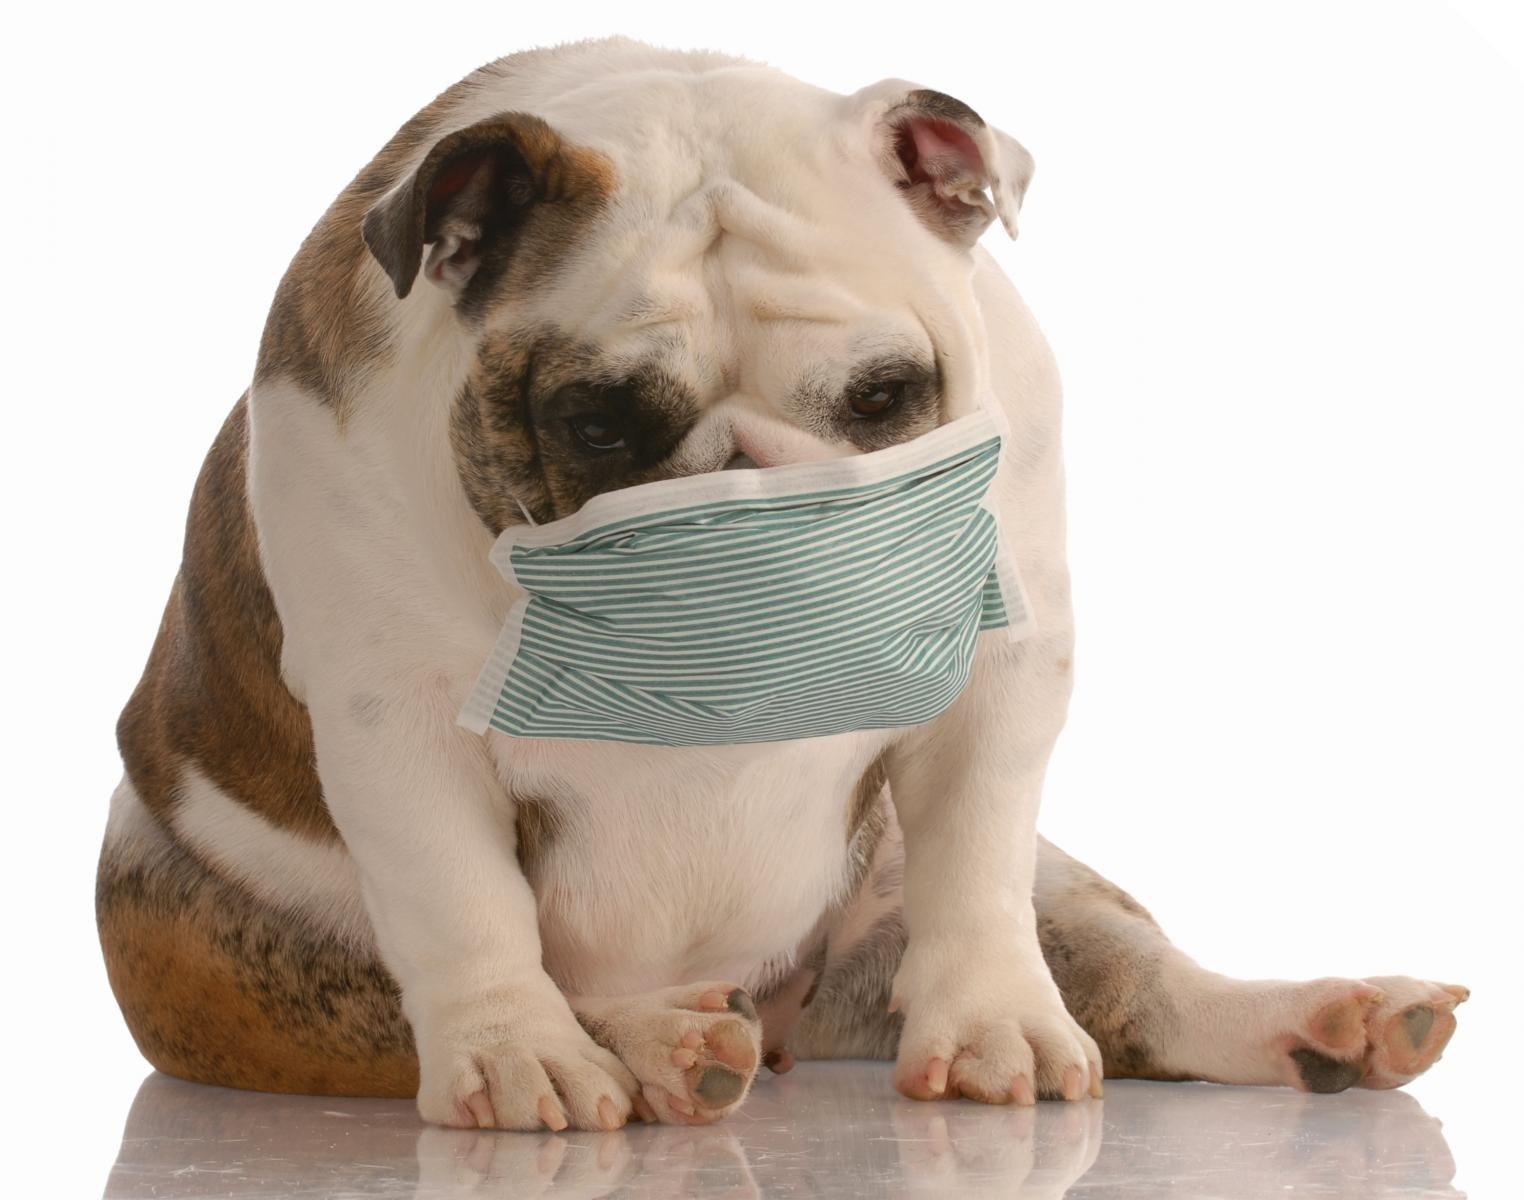 cachorro mascara coronavirus prego e martelo